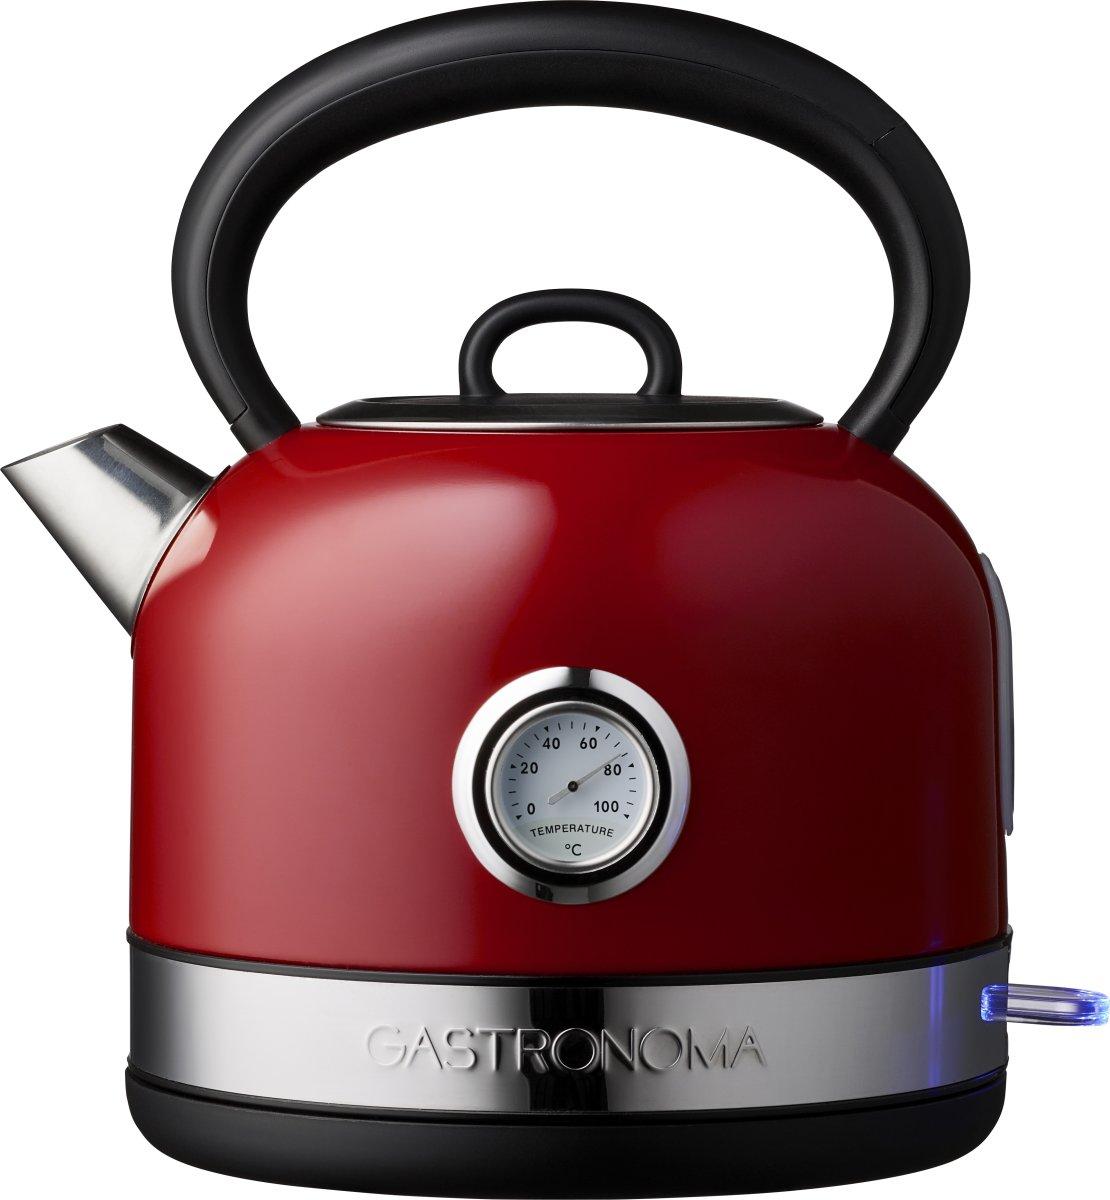 Gastronoma Dome elkedel 1,7 L, rød